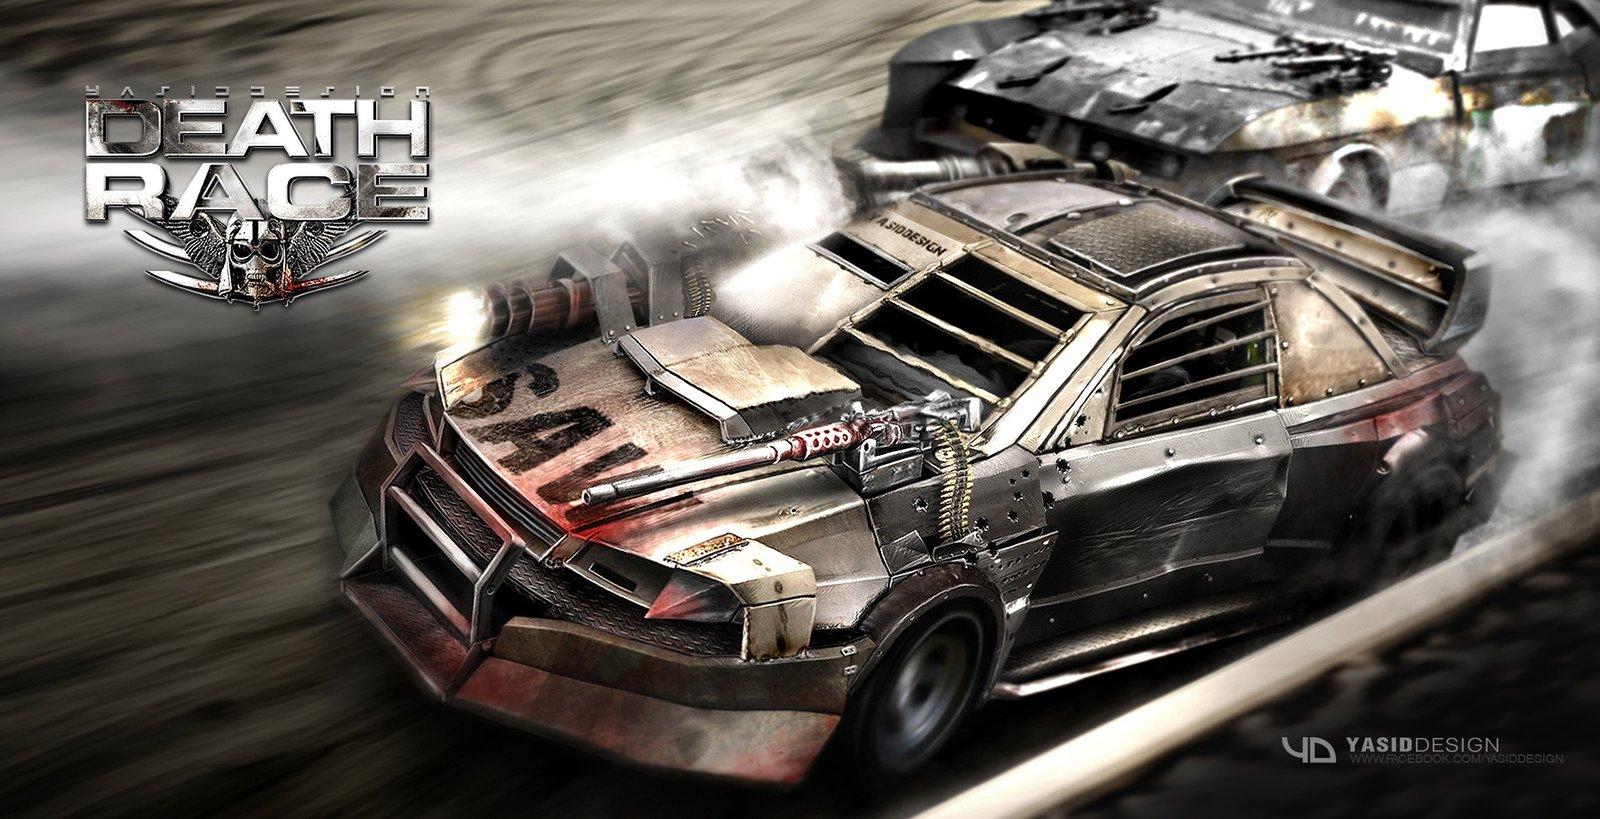 Death race subaru/action cam (lol)